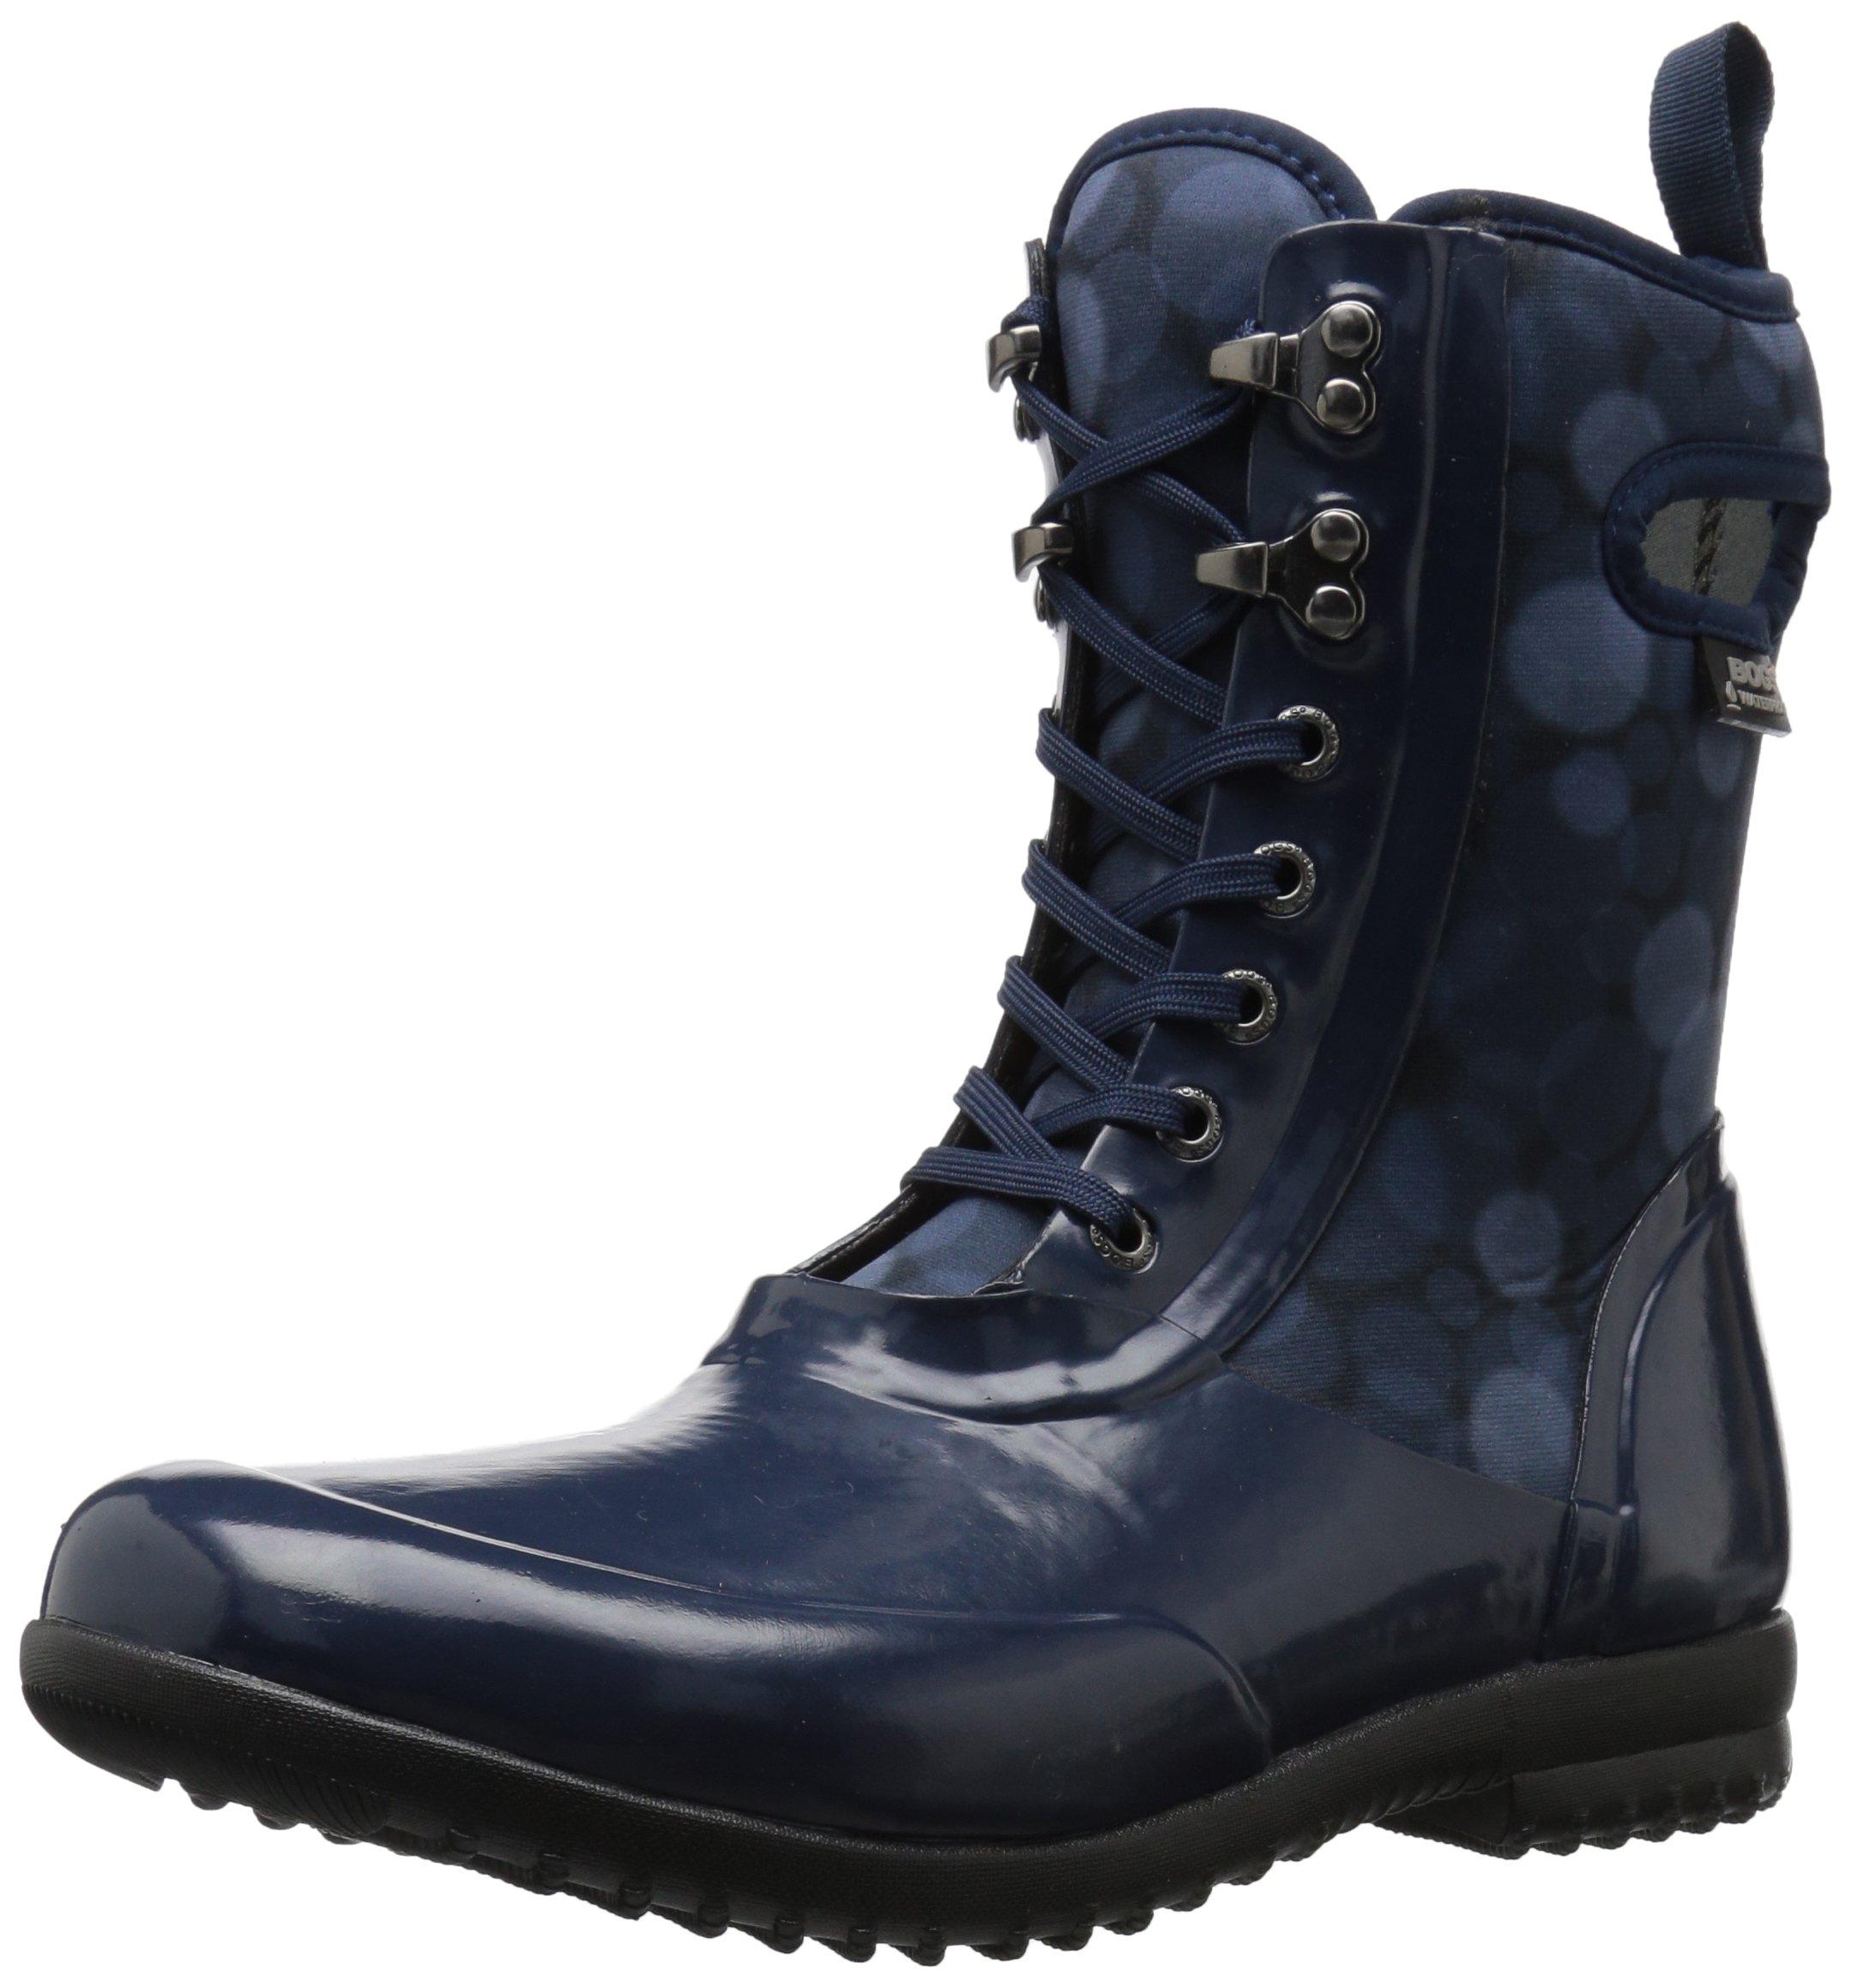 Bogs Women's Sidney Lace Rain Snow Boot,Dark Blue/Multi,7 M US